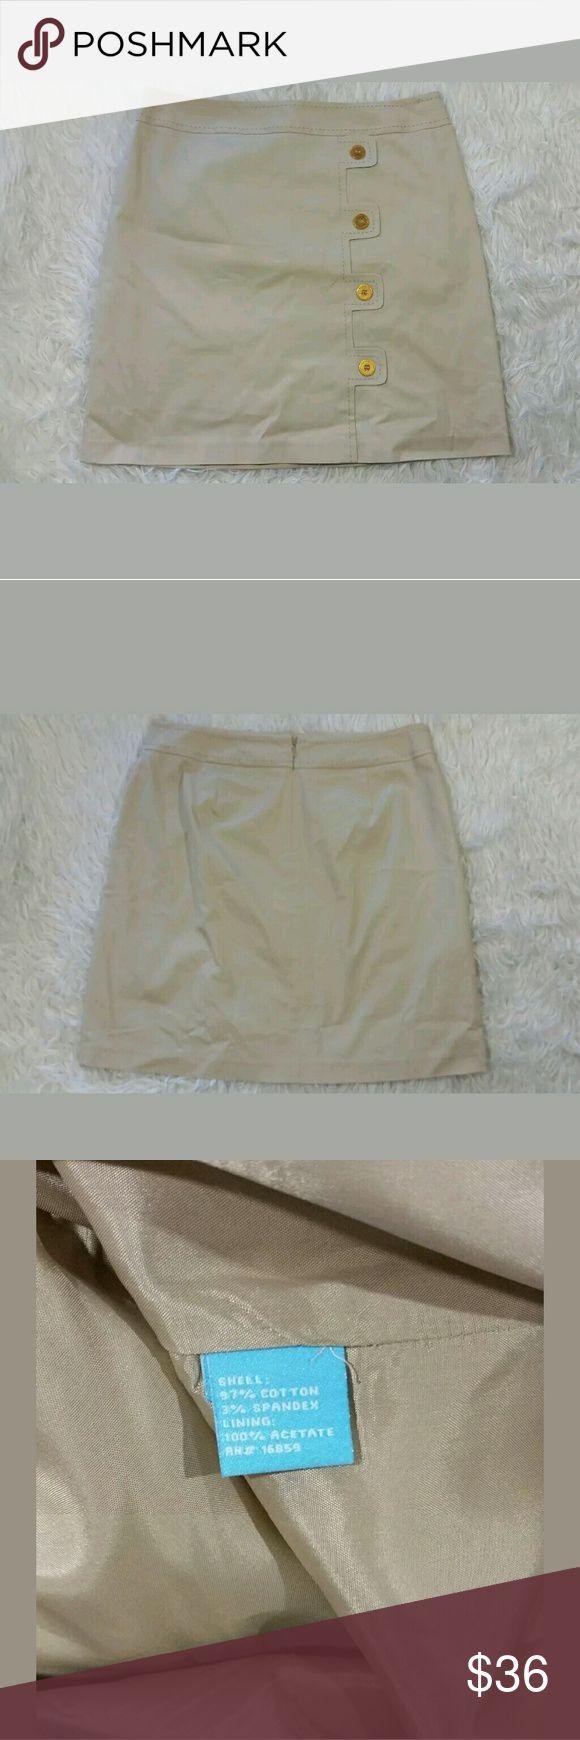 J. McLaughlin Khaki Pencil Skirt Buttons J. McLaughlin Khaki Pencil Skirt Buttons Tan Gold Size 10  Excellent used condition.  33 inch waist.  42 inch hips.  19.75 inches long.   LB J. McLaughlin Skirts